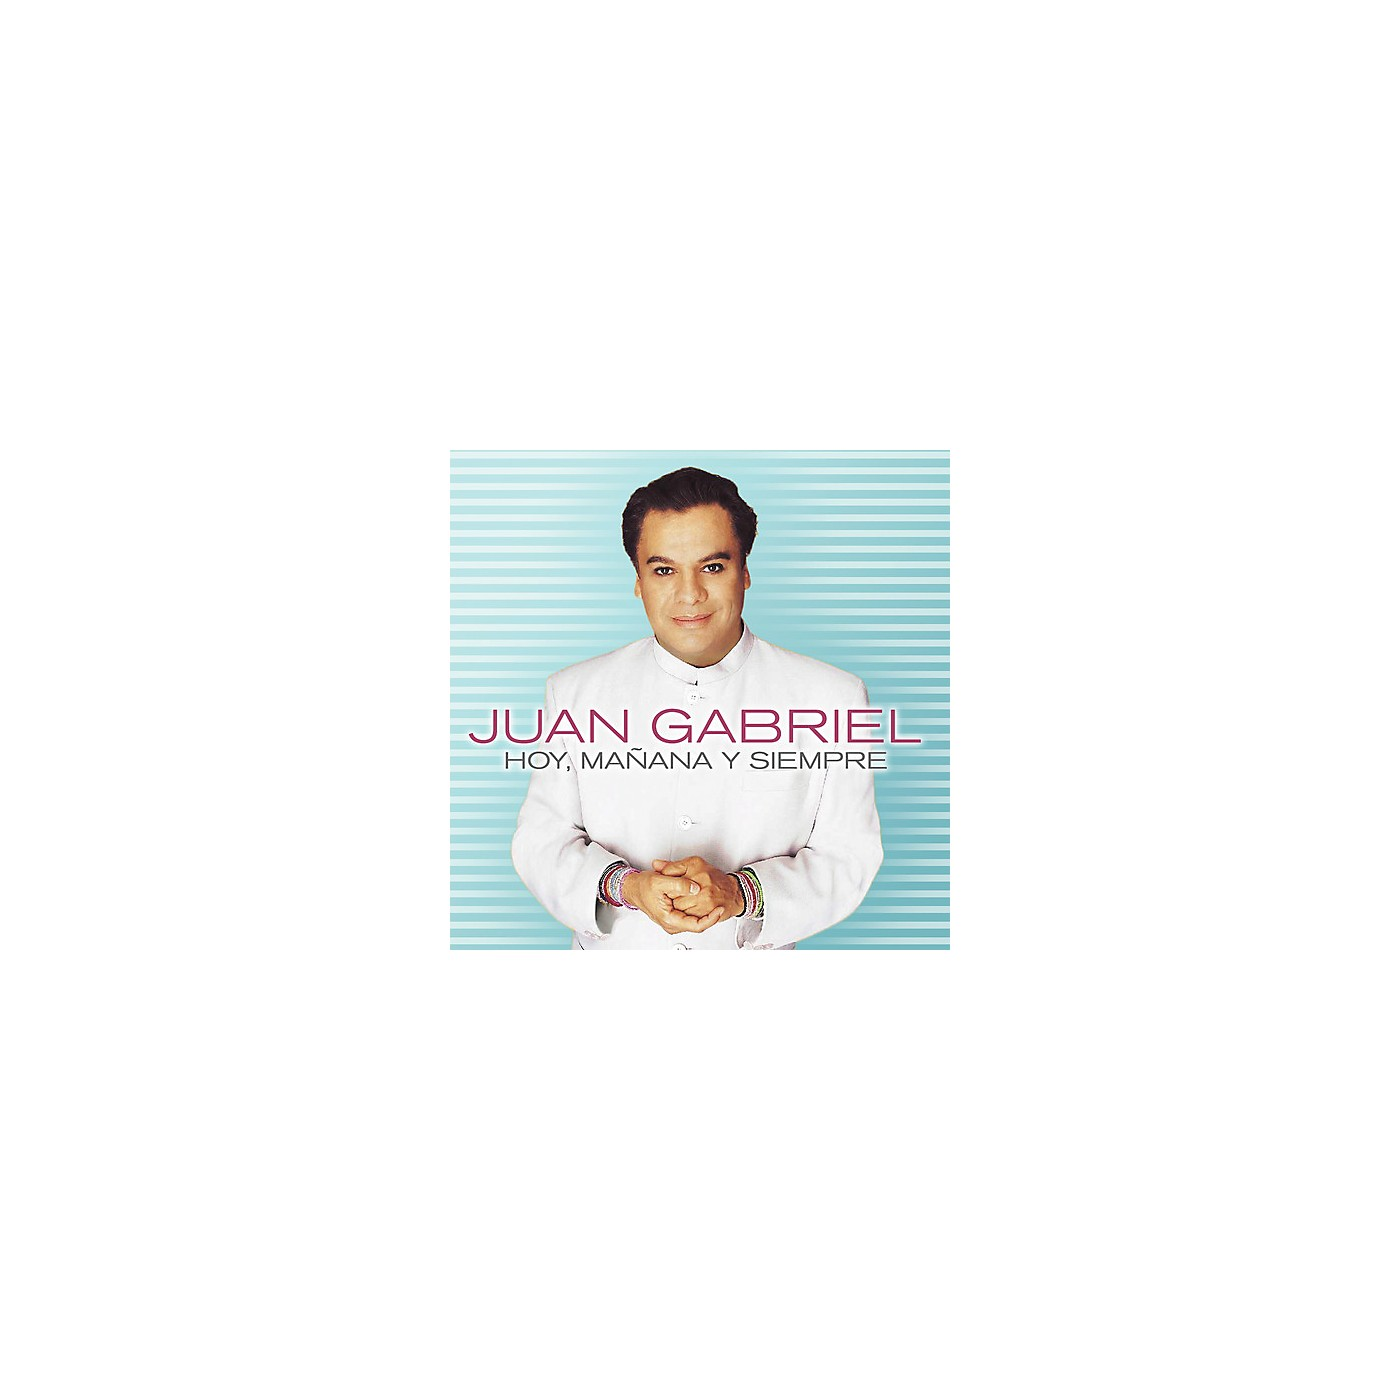 Alliance Juan Gabriel - Hoy, Manana Y Siempre (CD) thumbnail